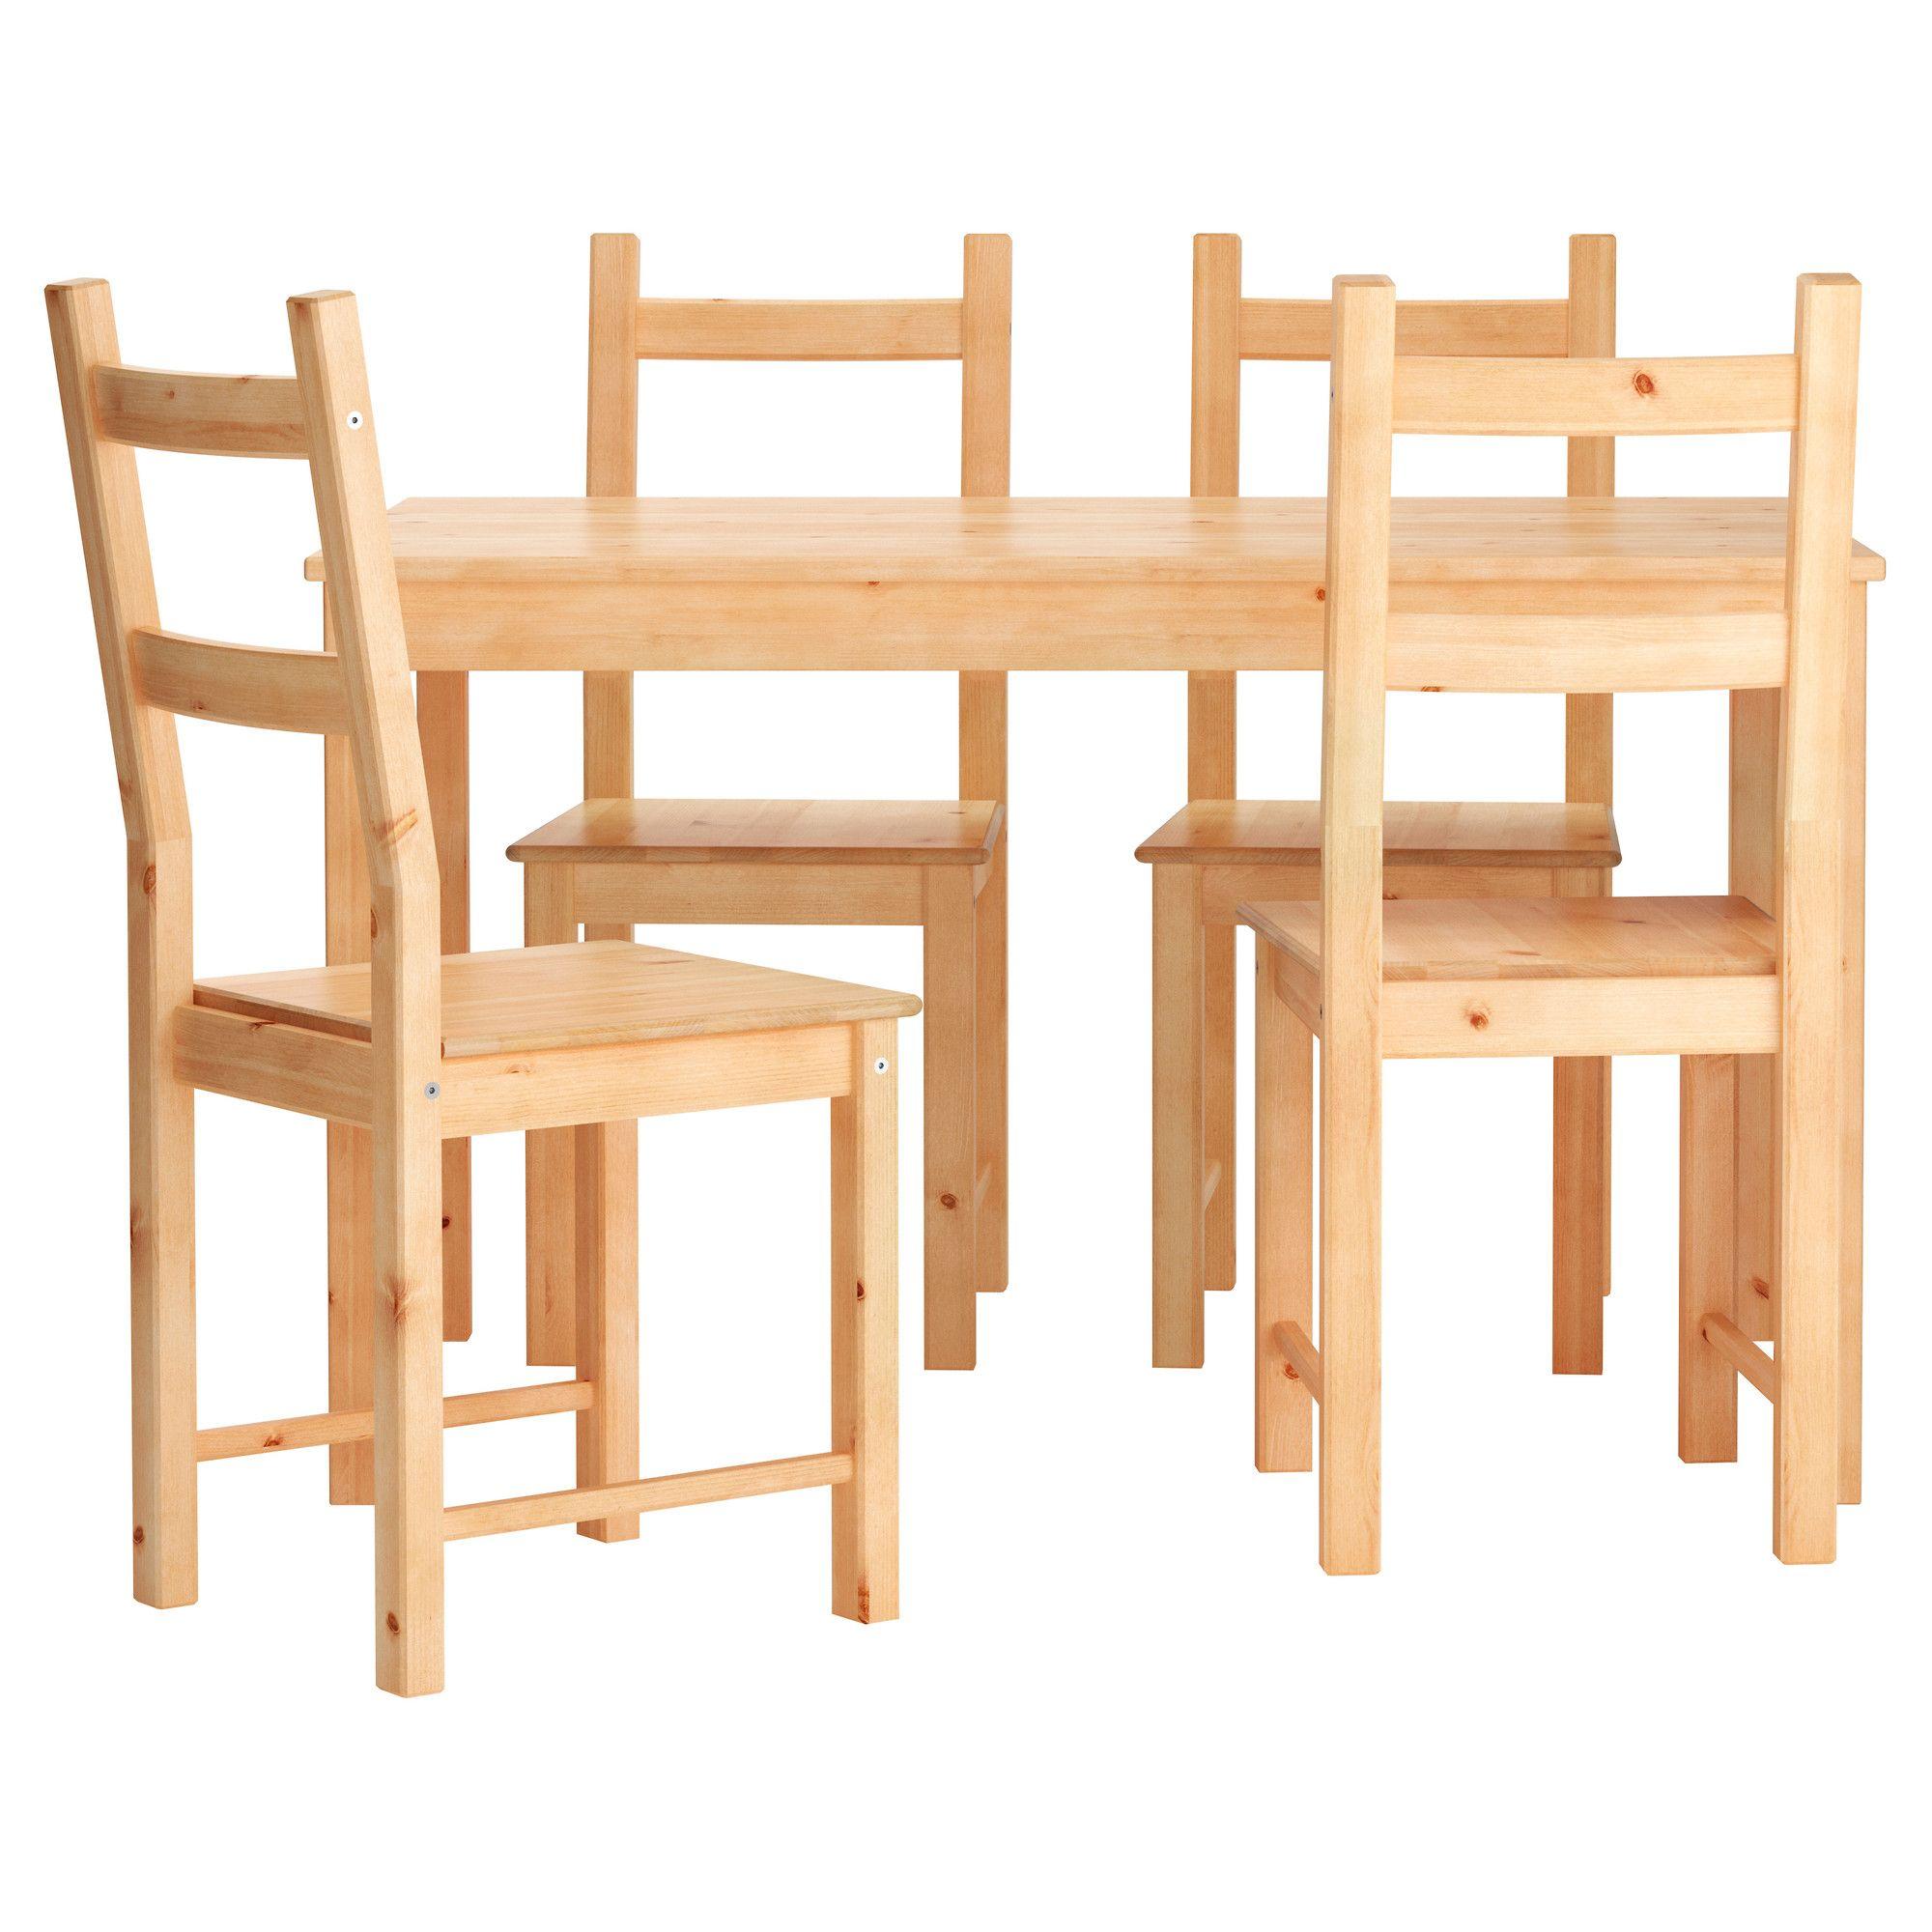 Ikea Us Furniture And Home Furnishings Ikea Dining Sets Ikea Dining Table Dining Table Chairs